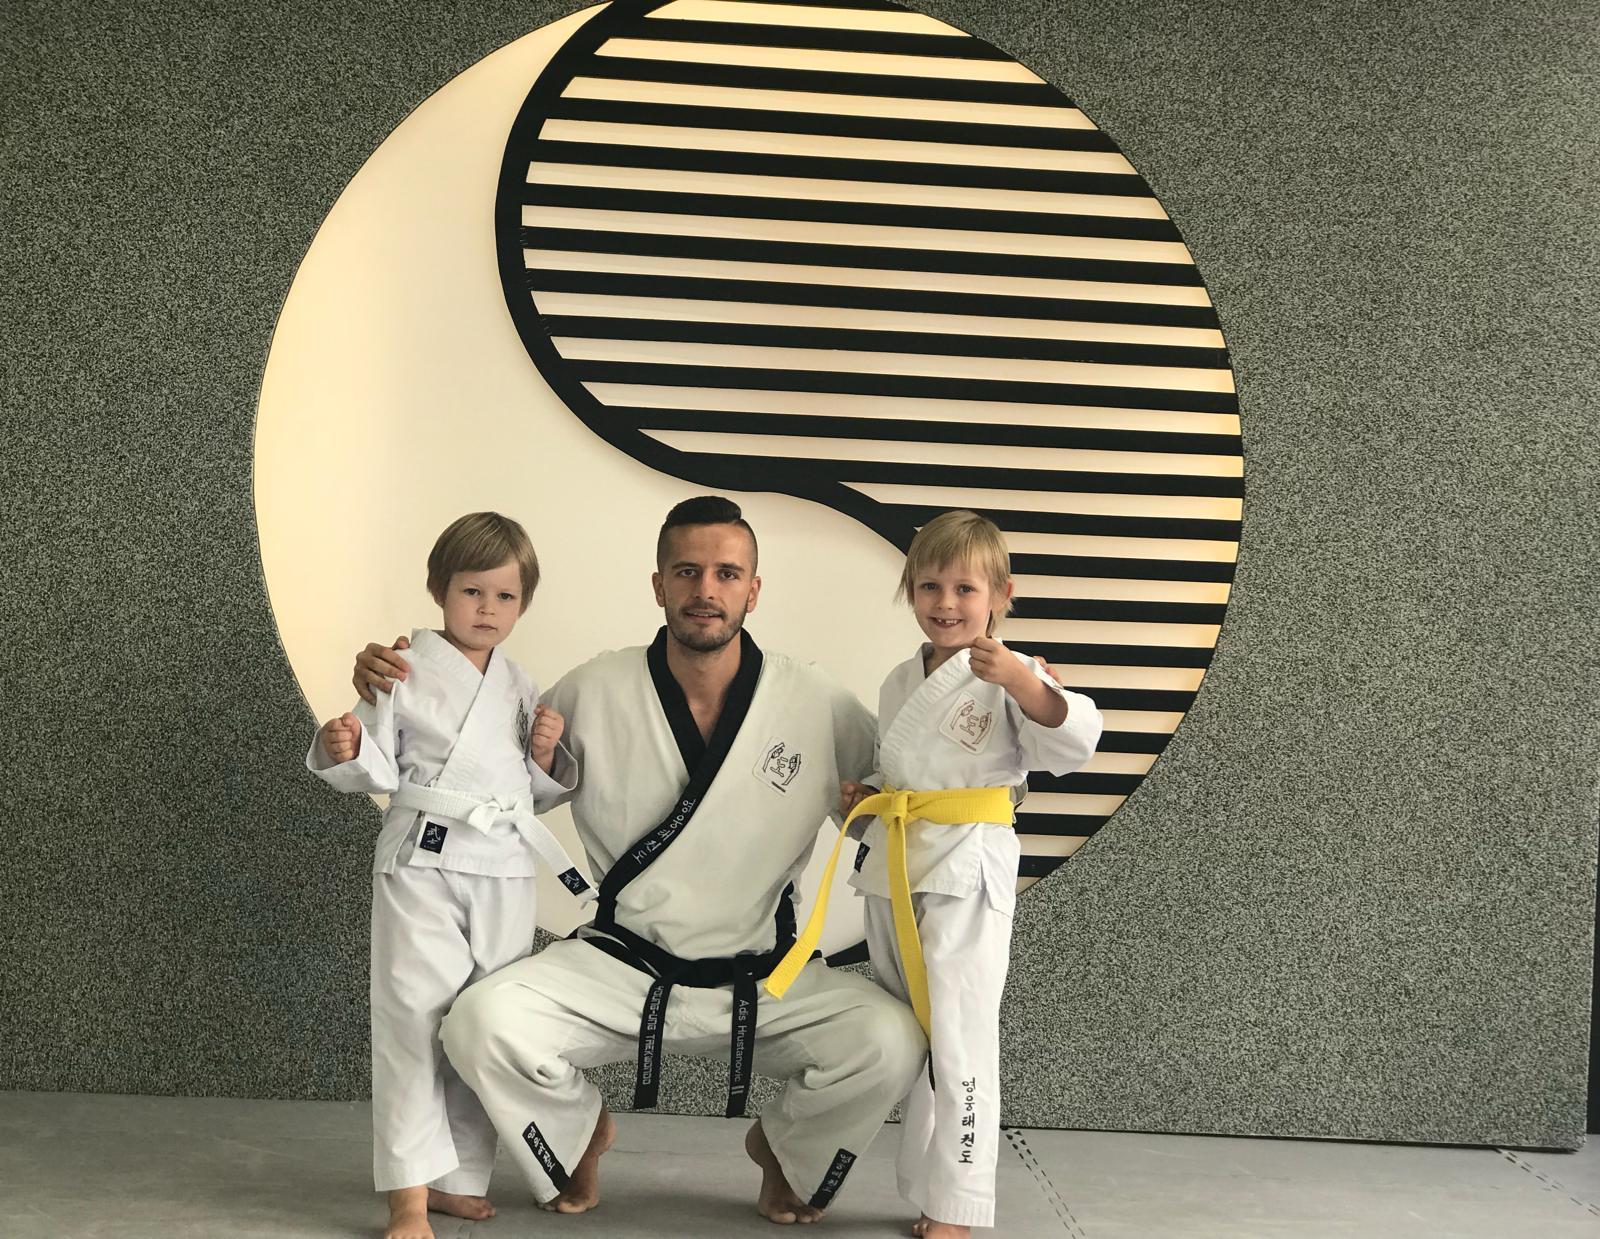 YOUNG-UNG Taekwondo Kampfsport Feel-Good Story